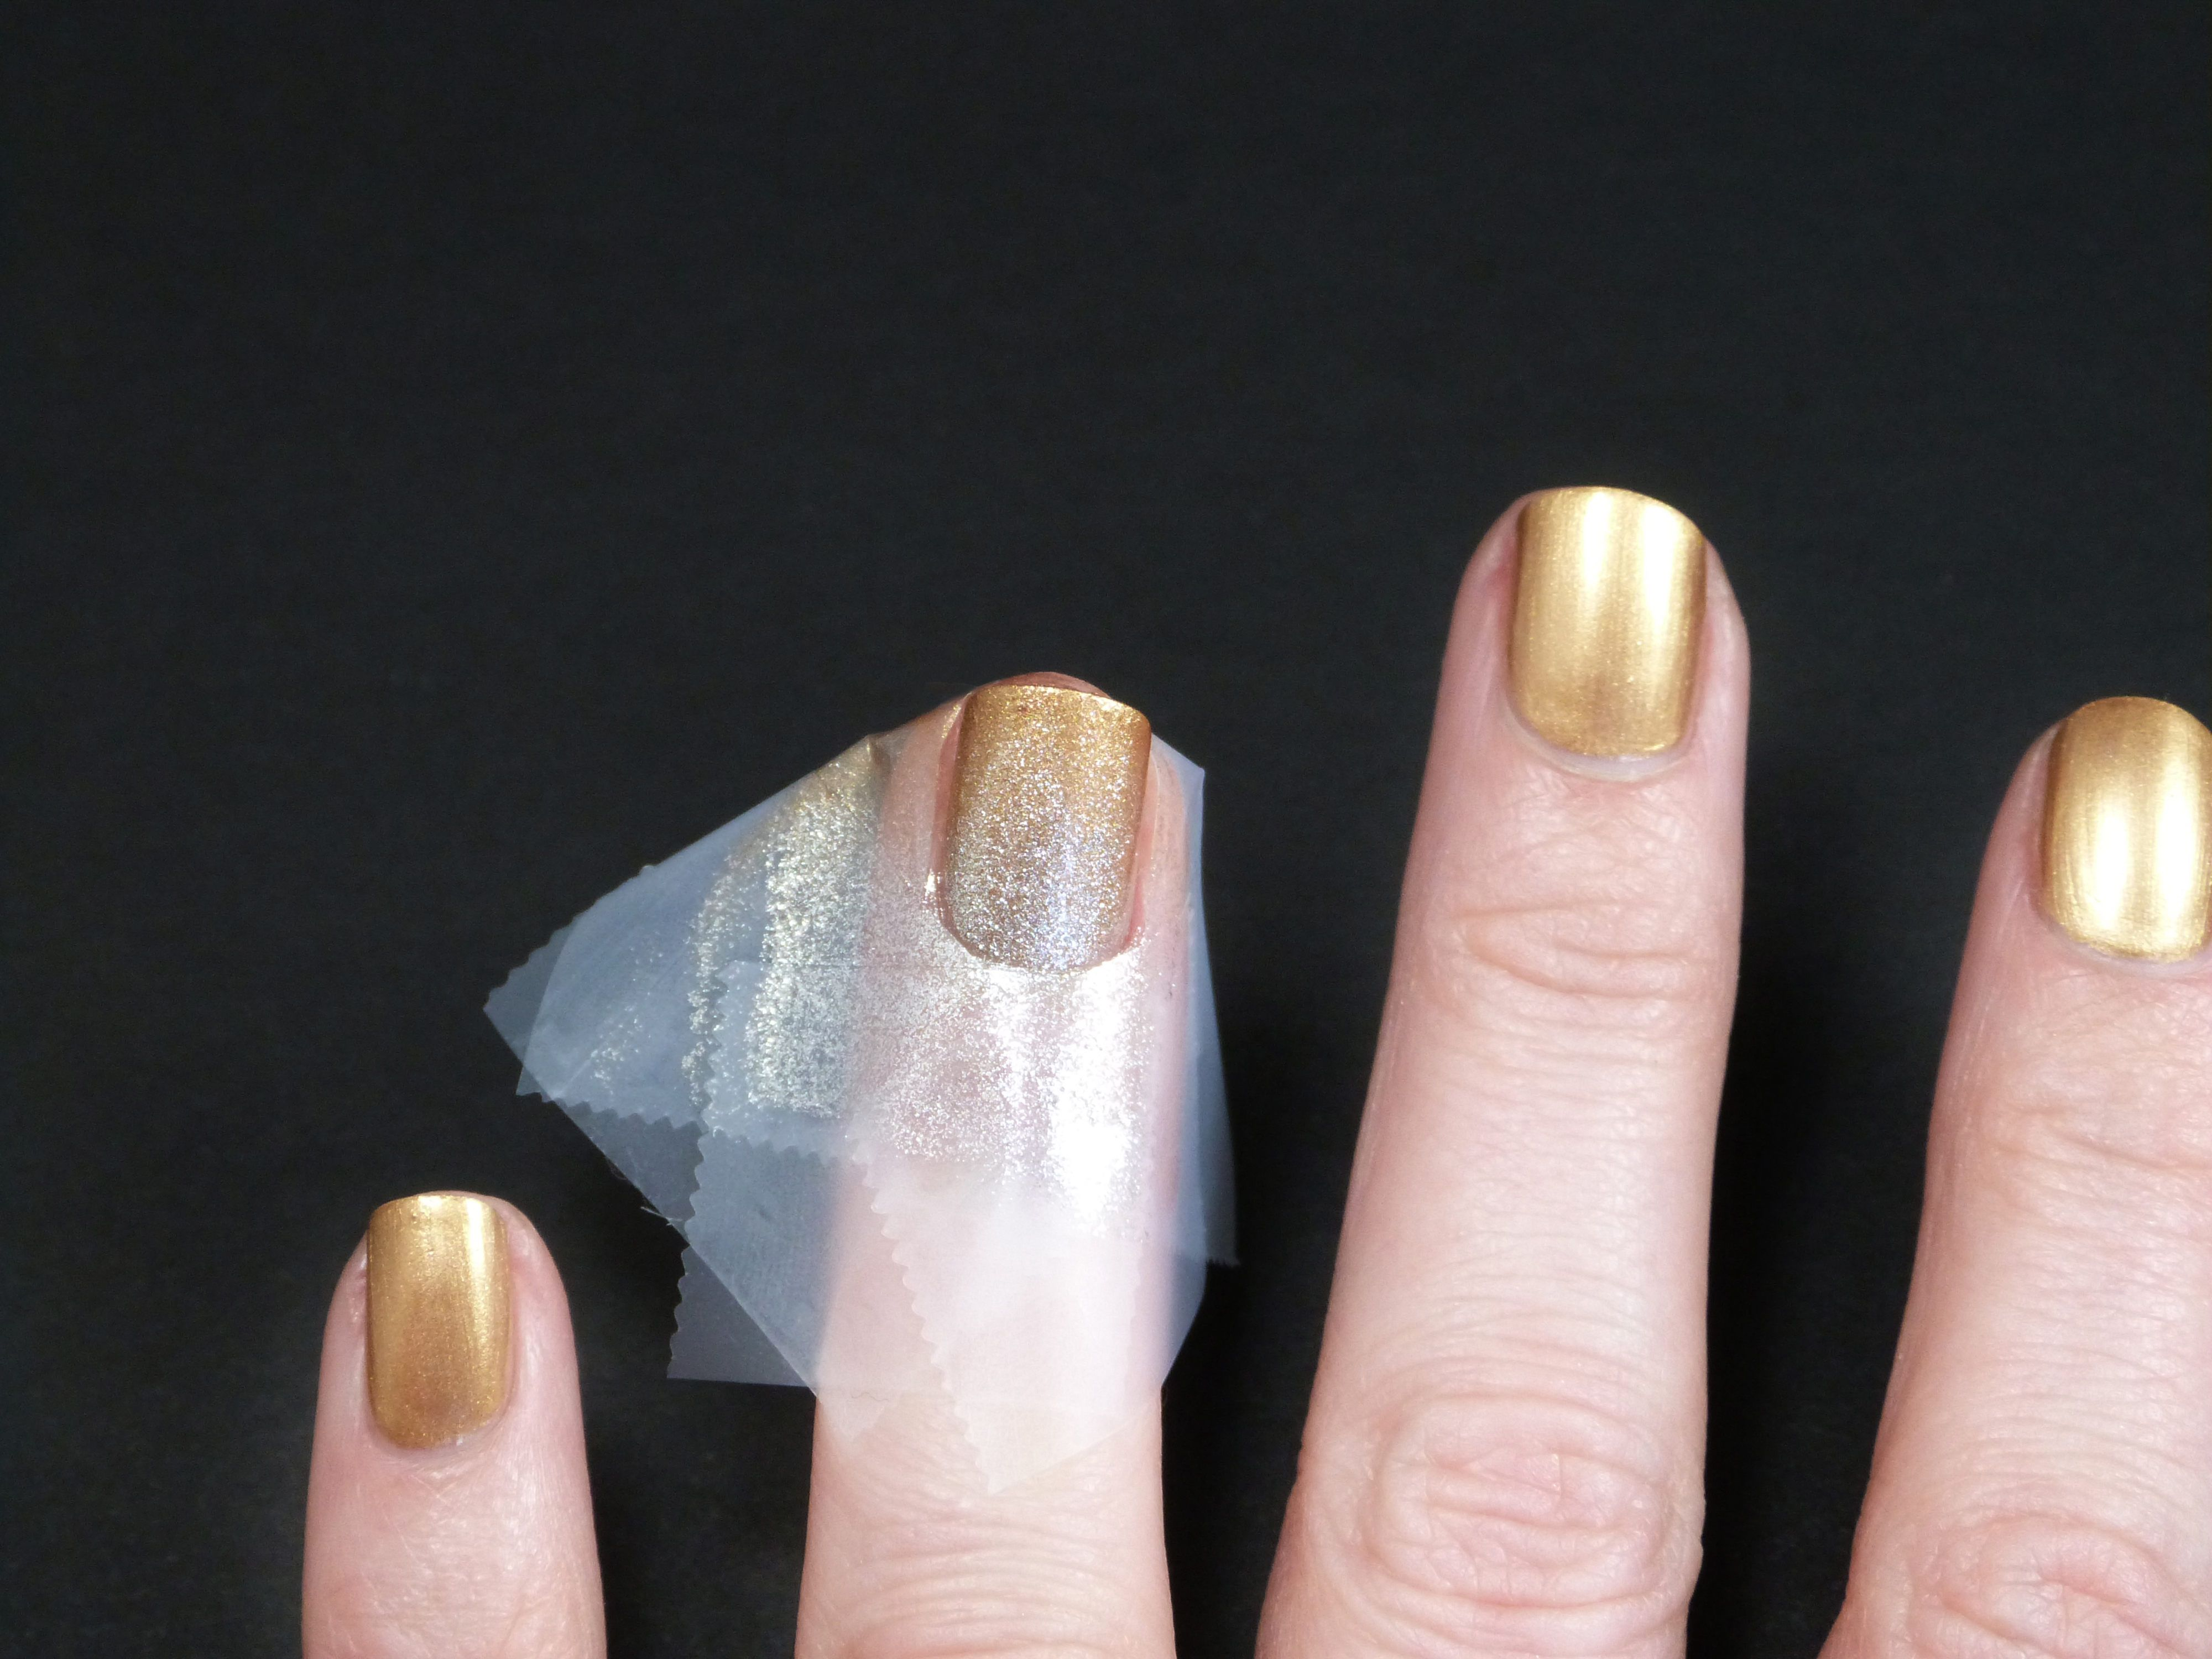 Scotch Magic Tape Art Deco Tutorial Step 6 Sponge The Paint Onto Nail